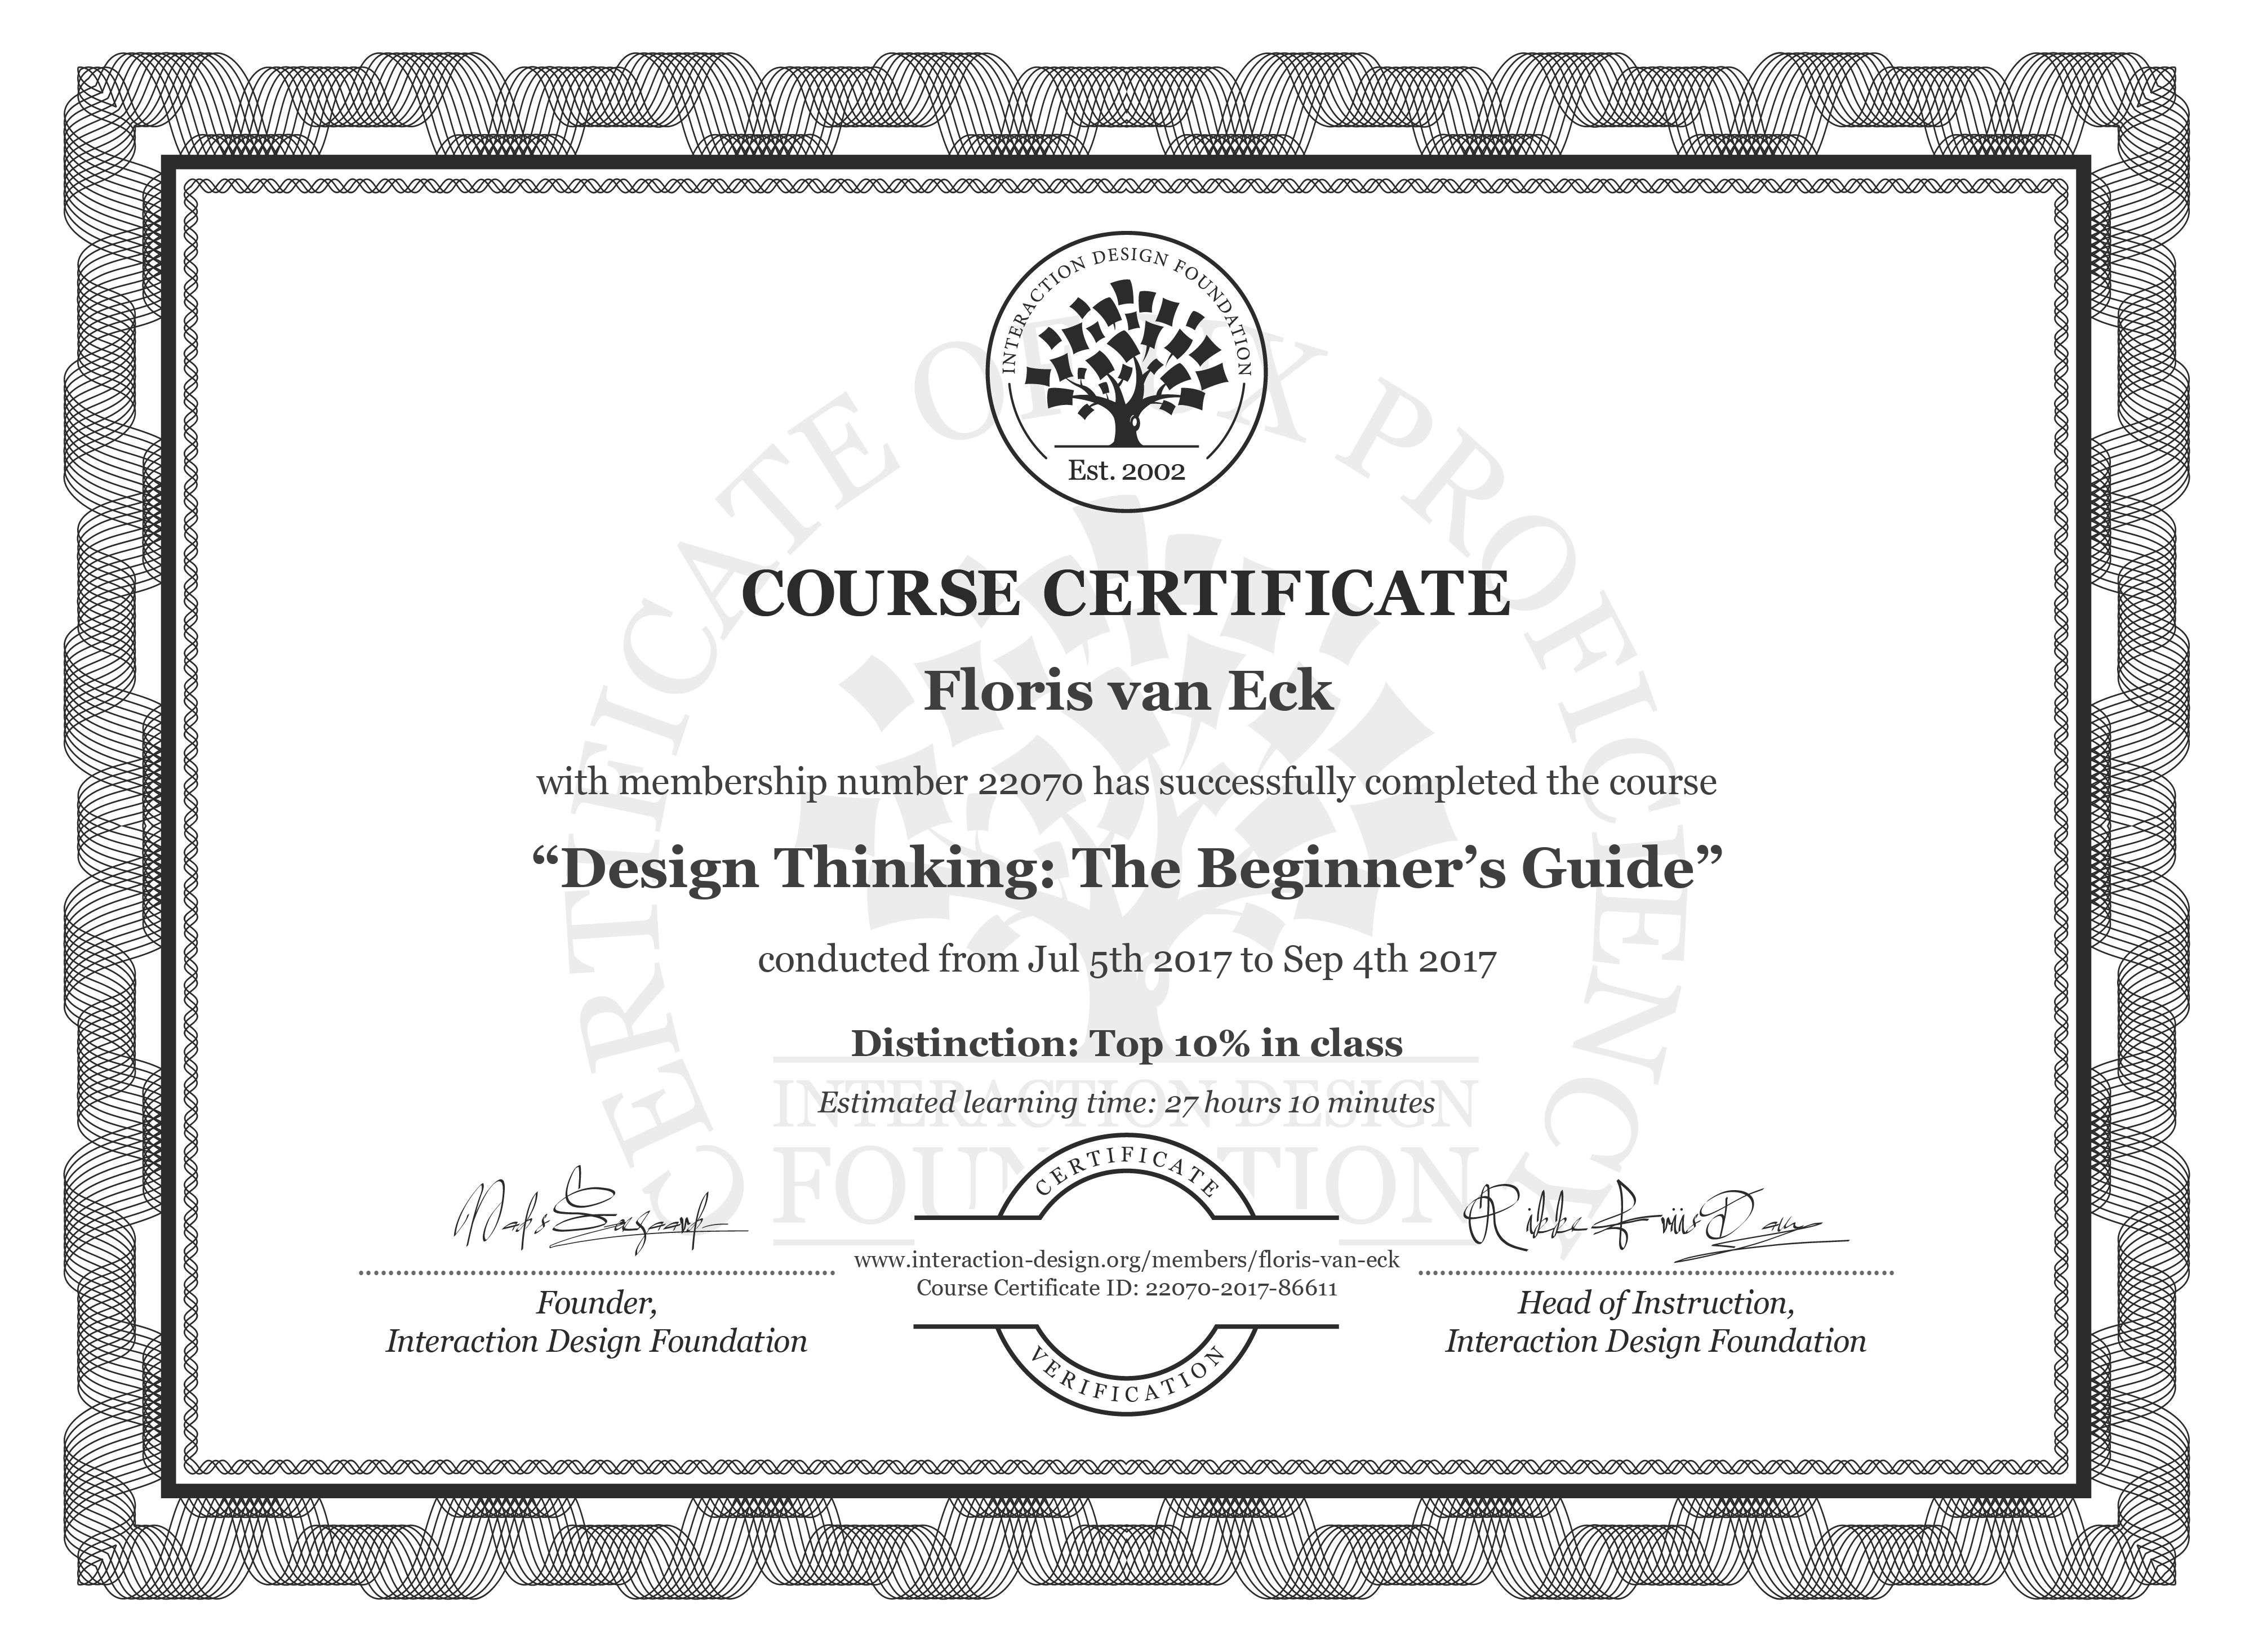 Floris van Eck's Course Certificate: Design Thinking: The Beginner's Guide